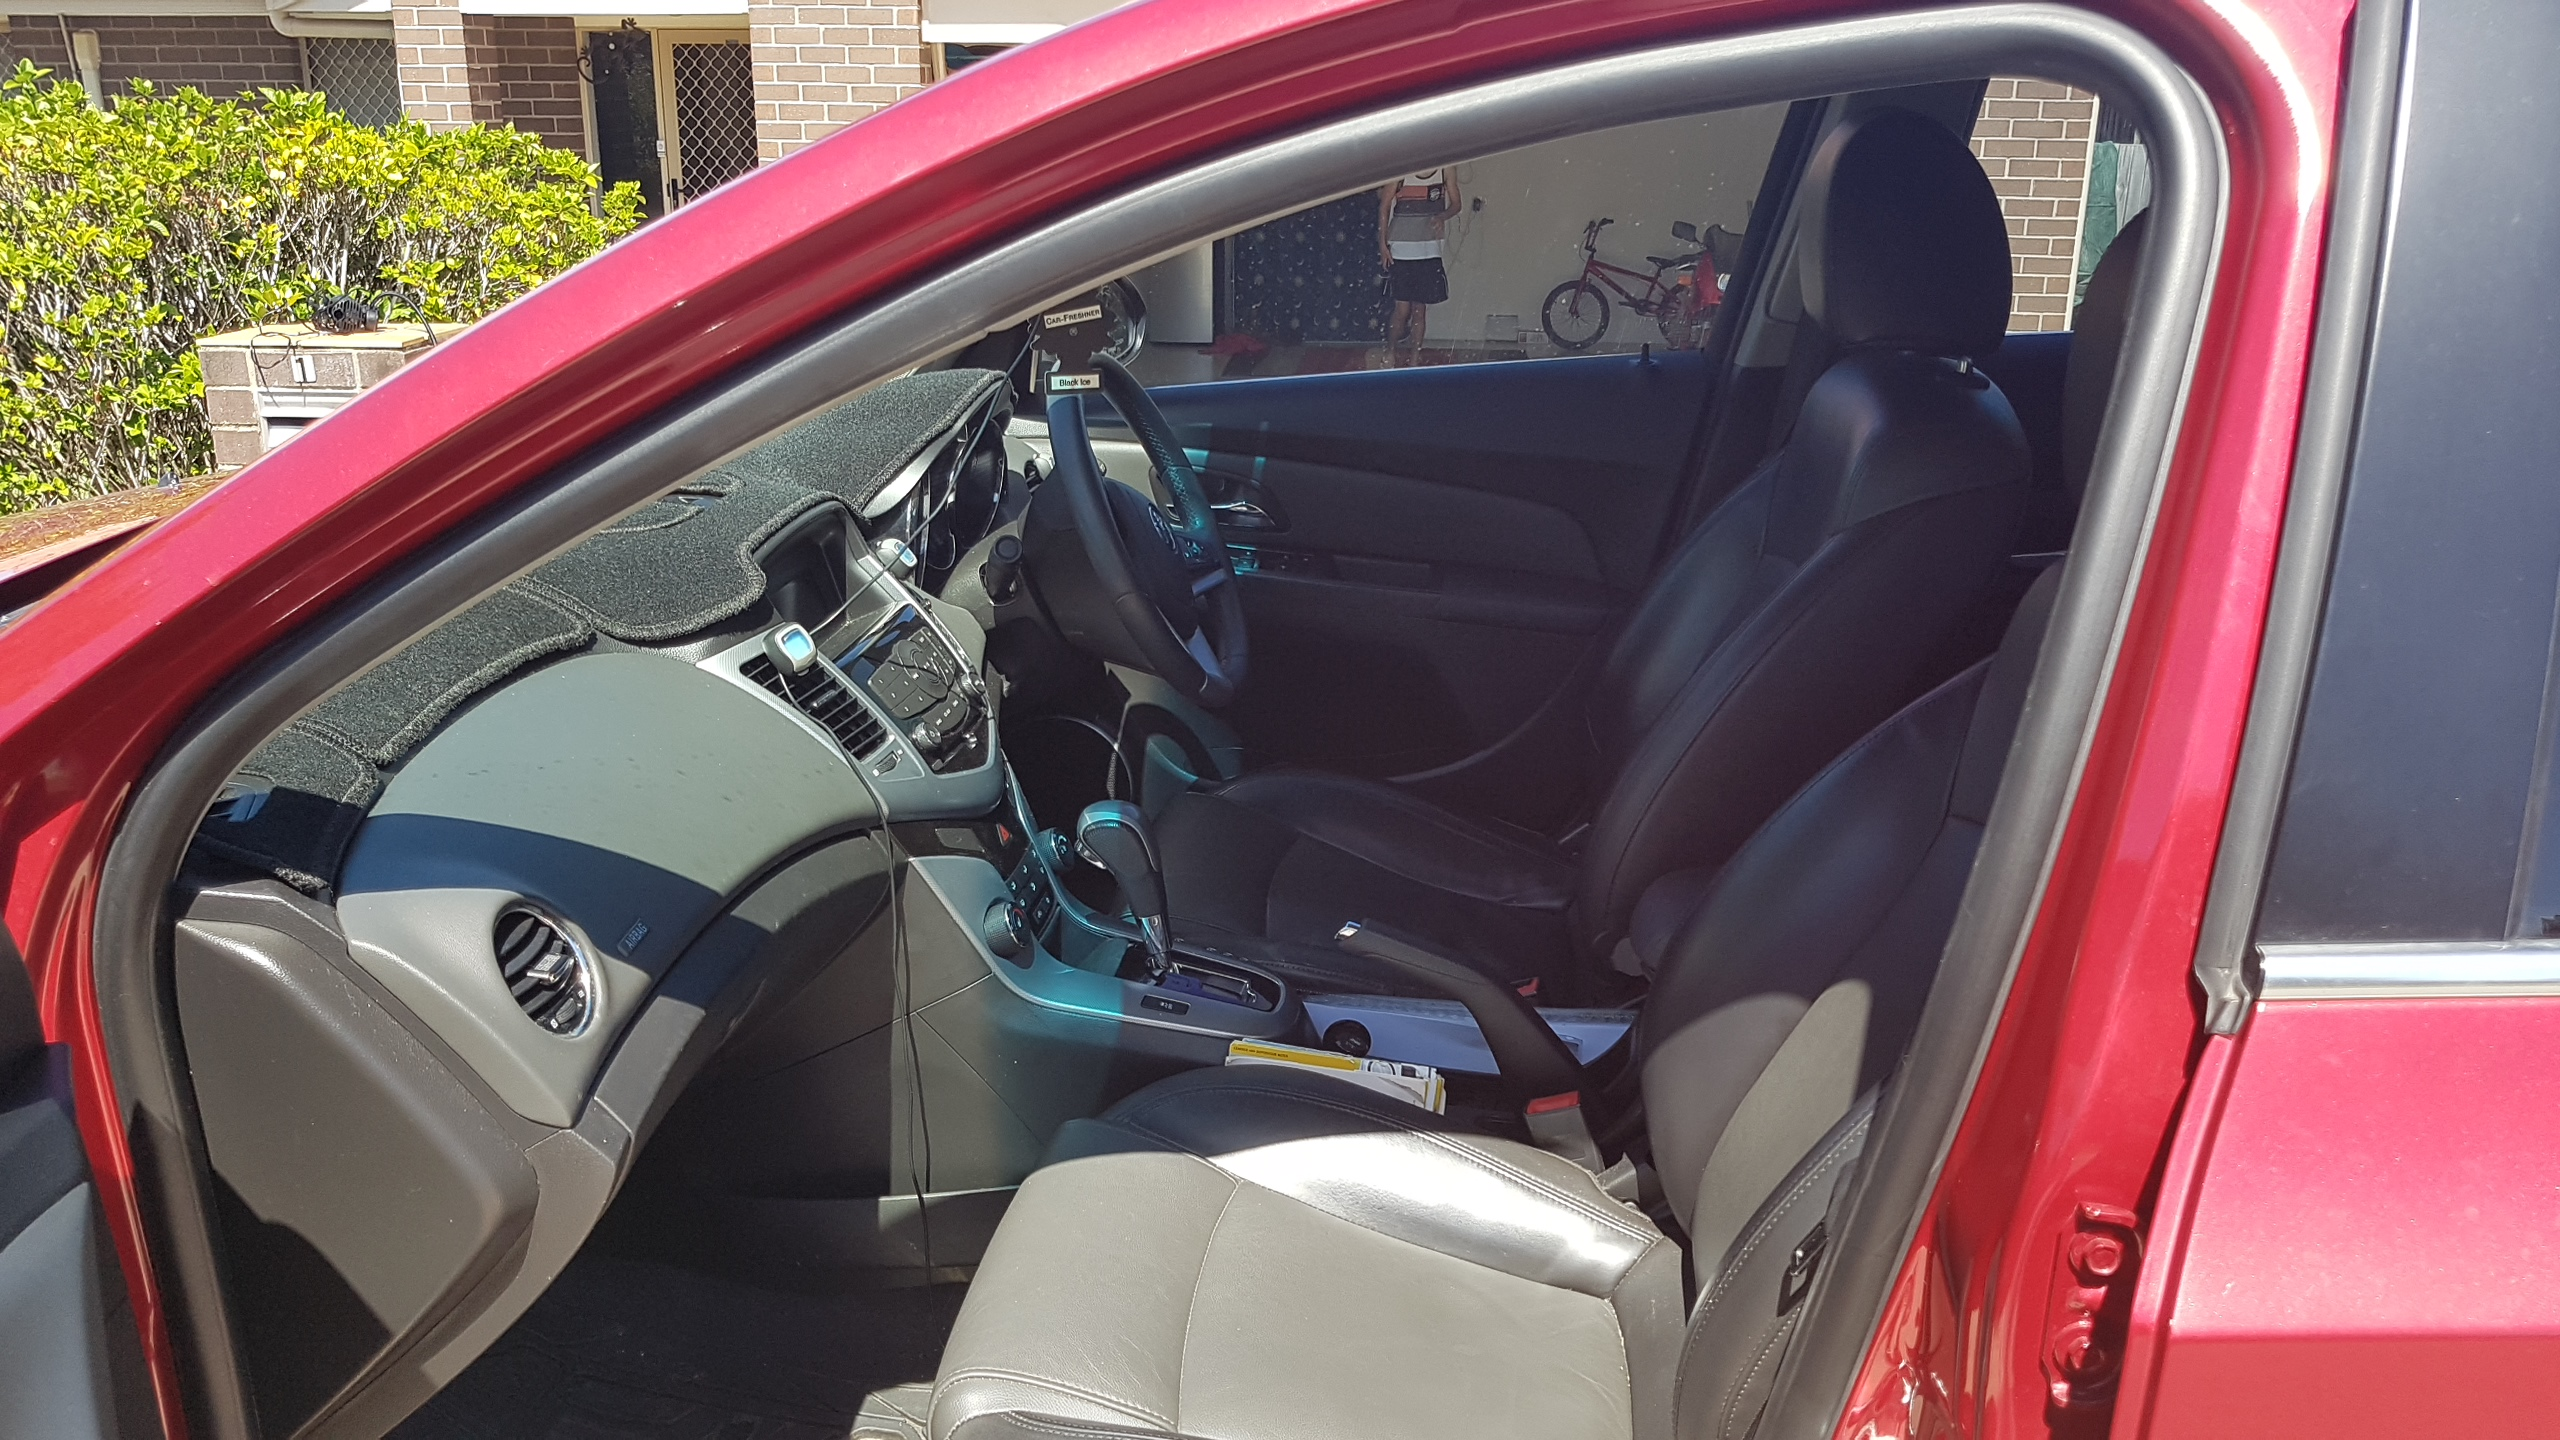 2011 Holden Cruze Cdx Jg Car Sales Qld Brisbane North